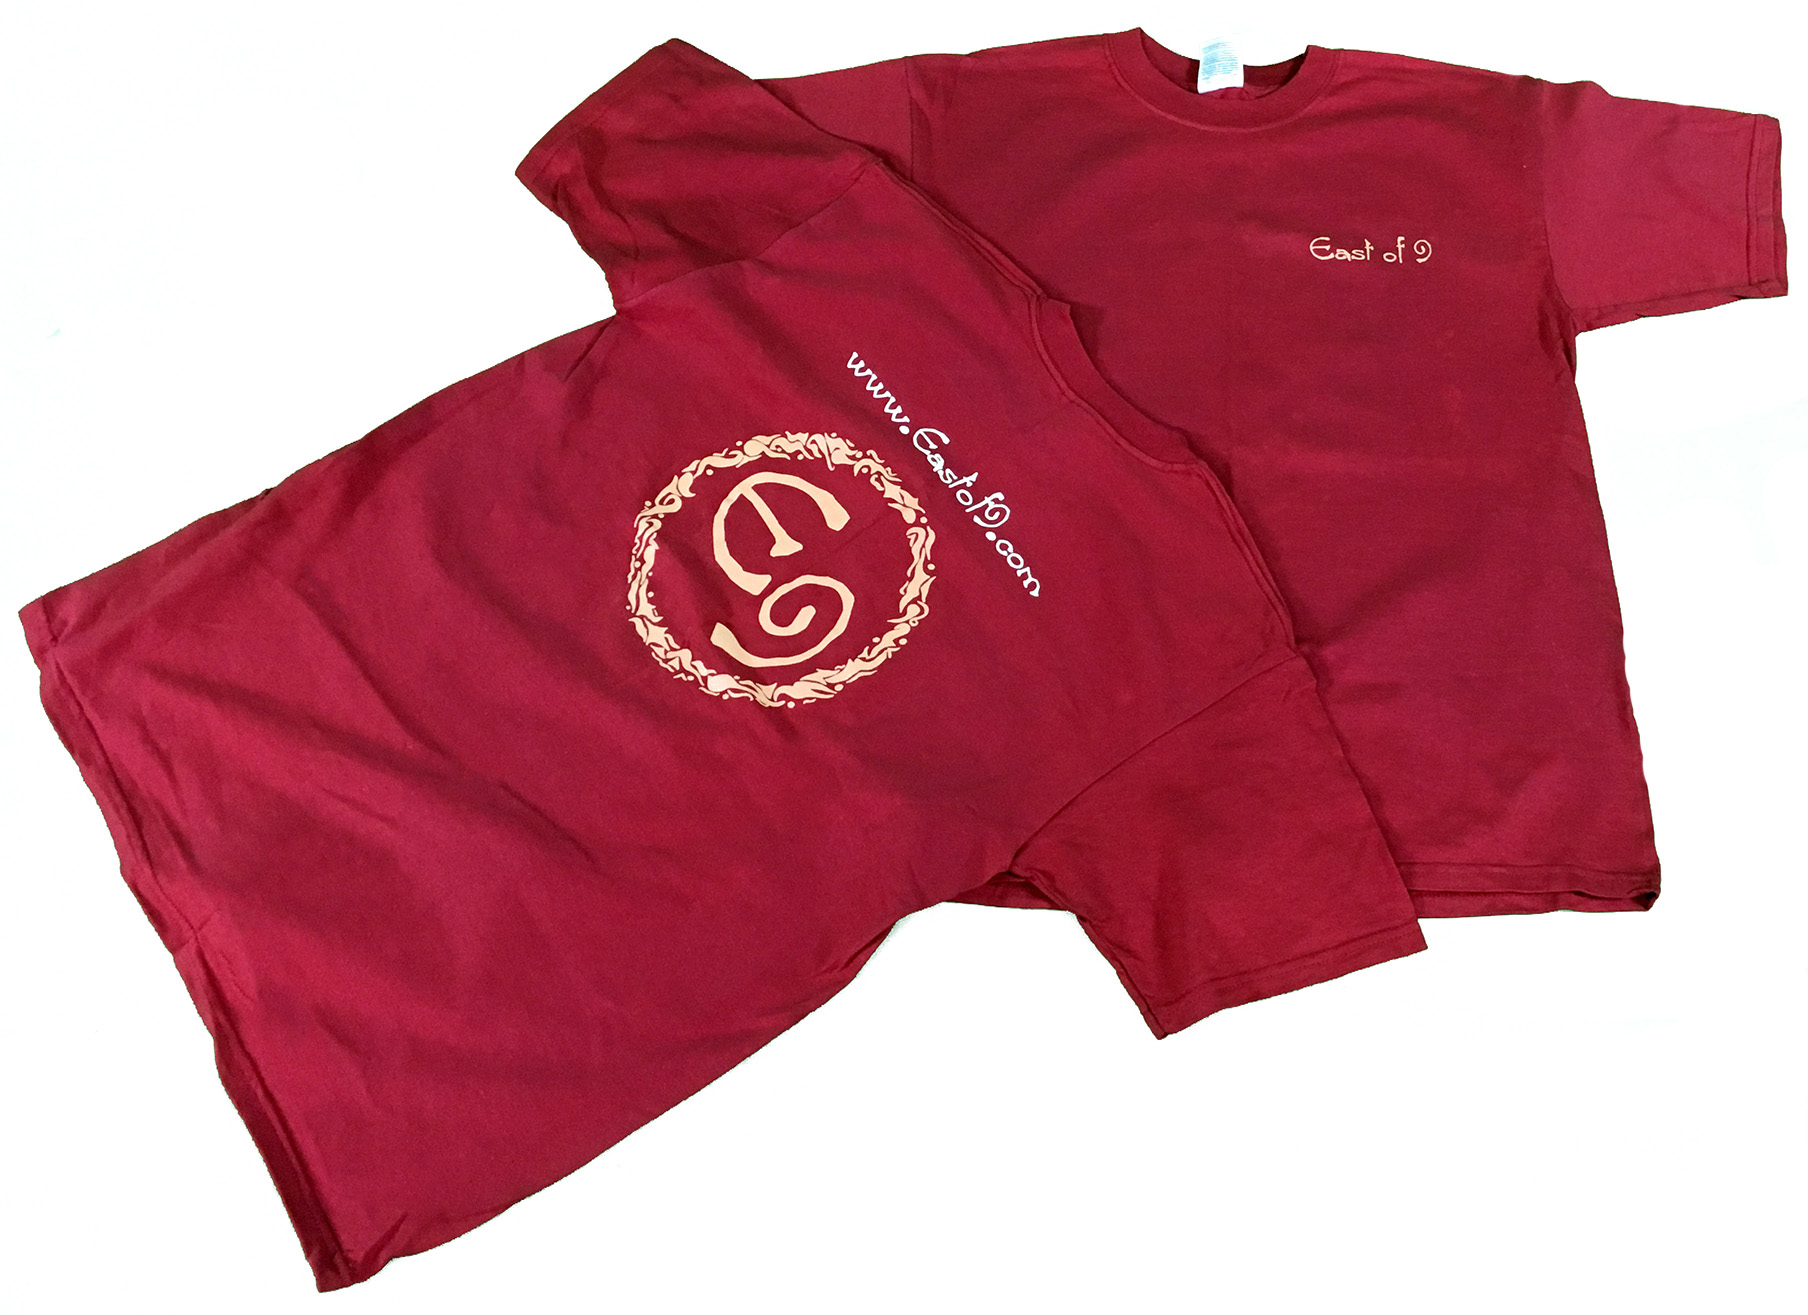 E9 T-Shirt (overlay)